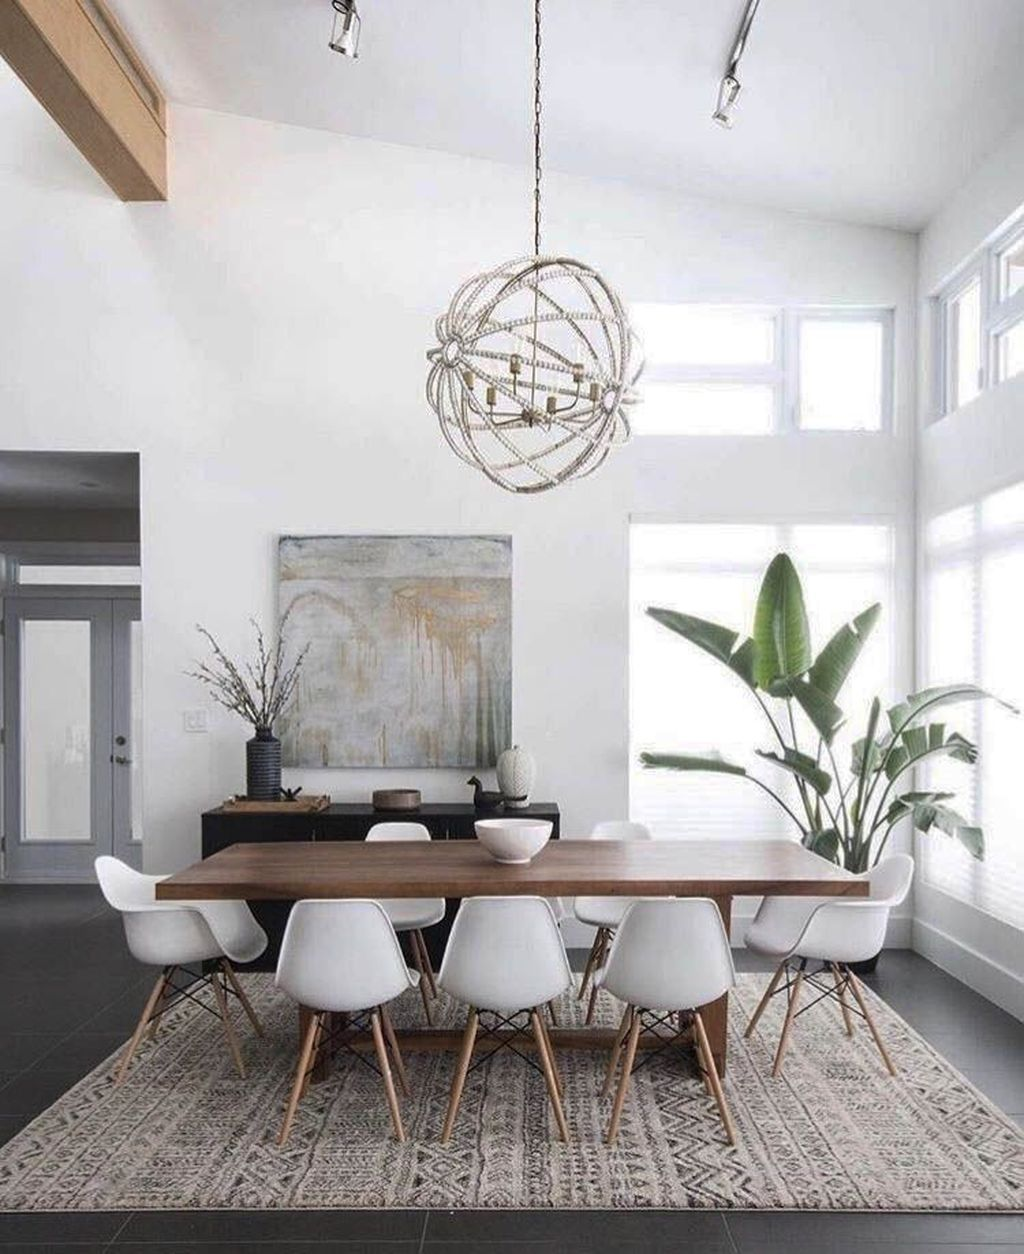 44 Popular Contemporary Dining Room Design Ideas Homyhomee Minimalist Dining Room Scandinavian Dining Room Minimal Dining Room